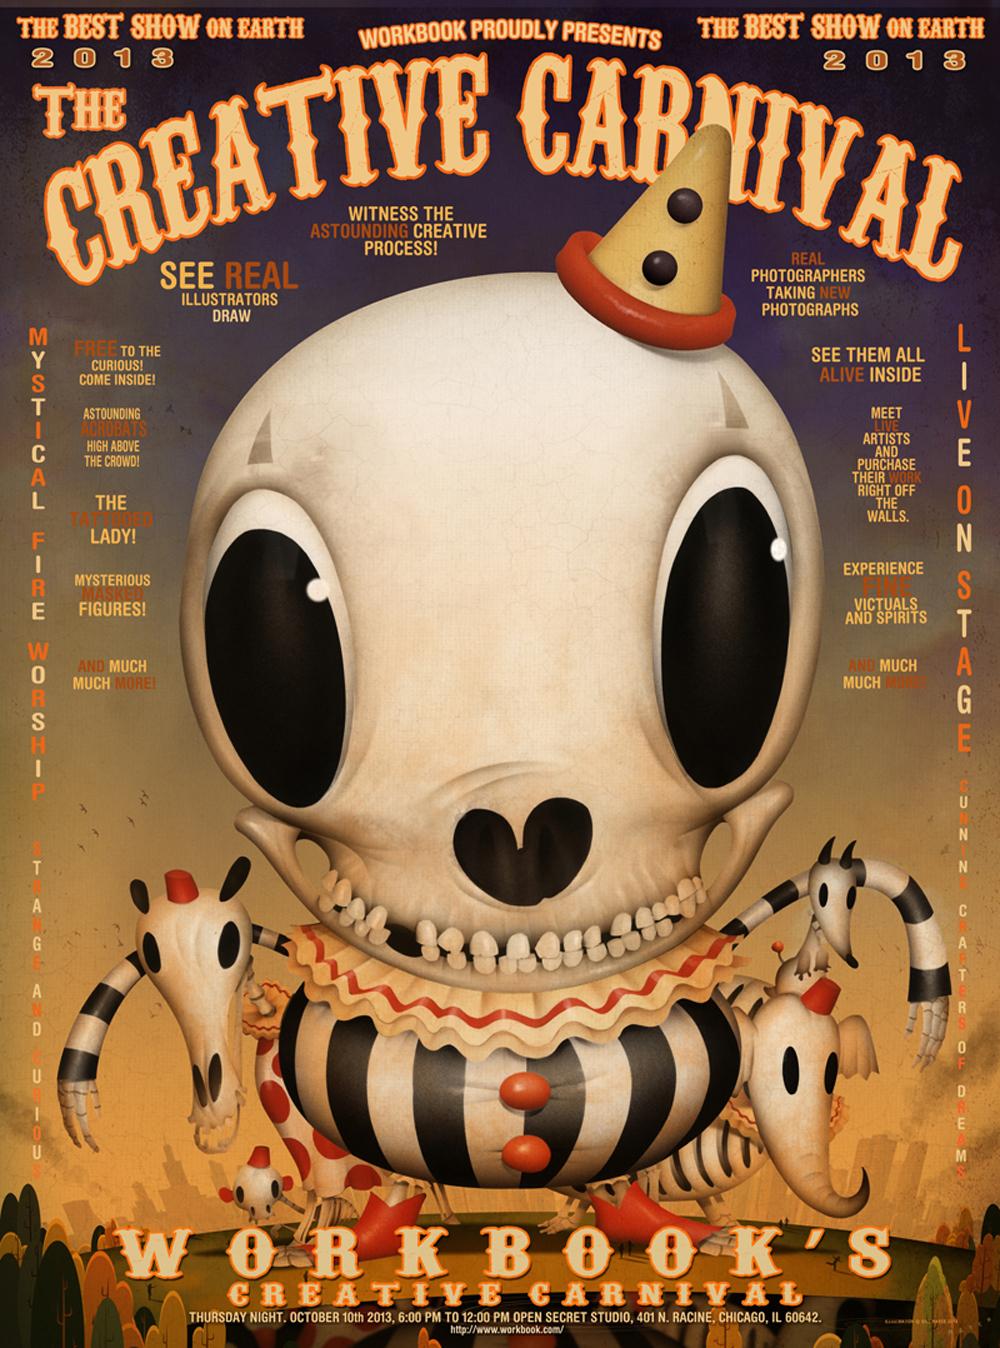 Creative Carnival 2013